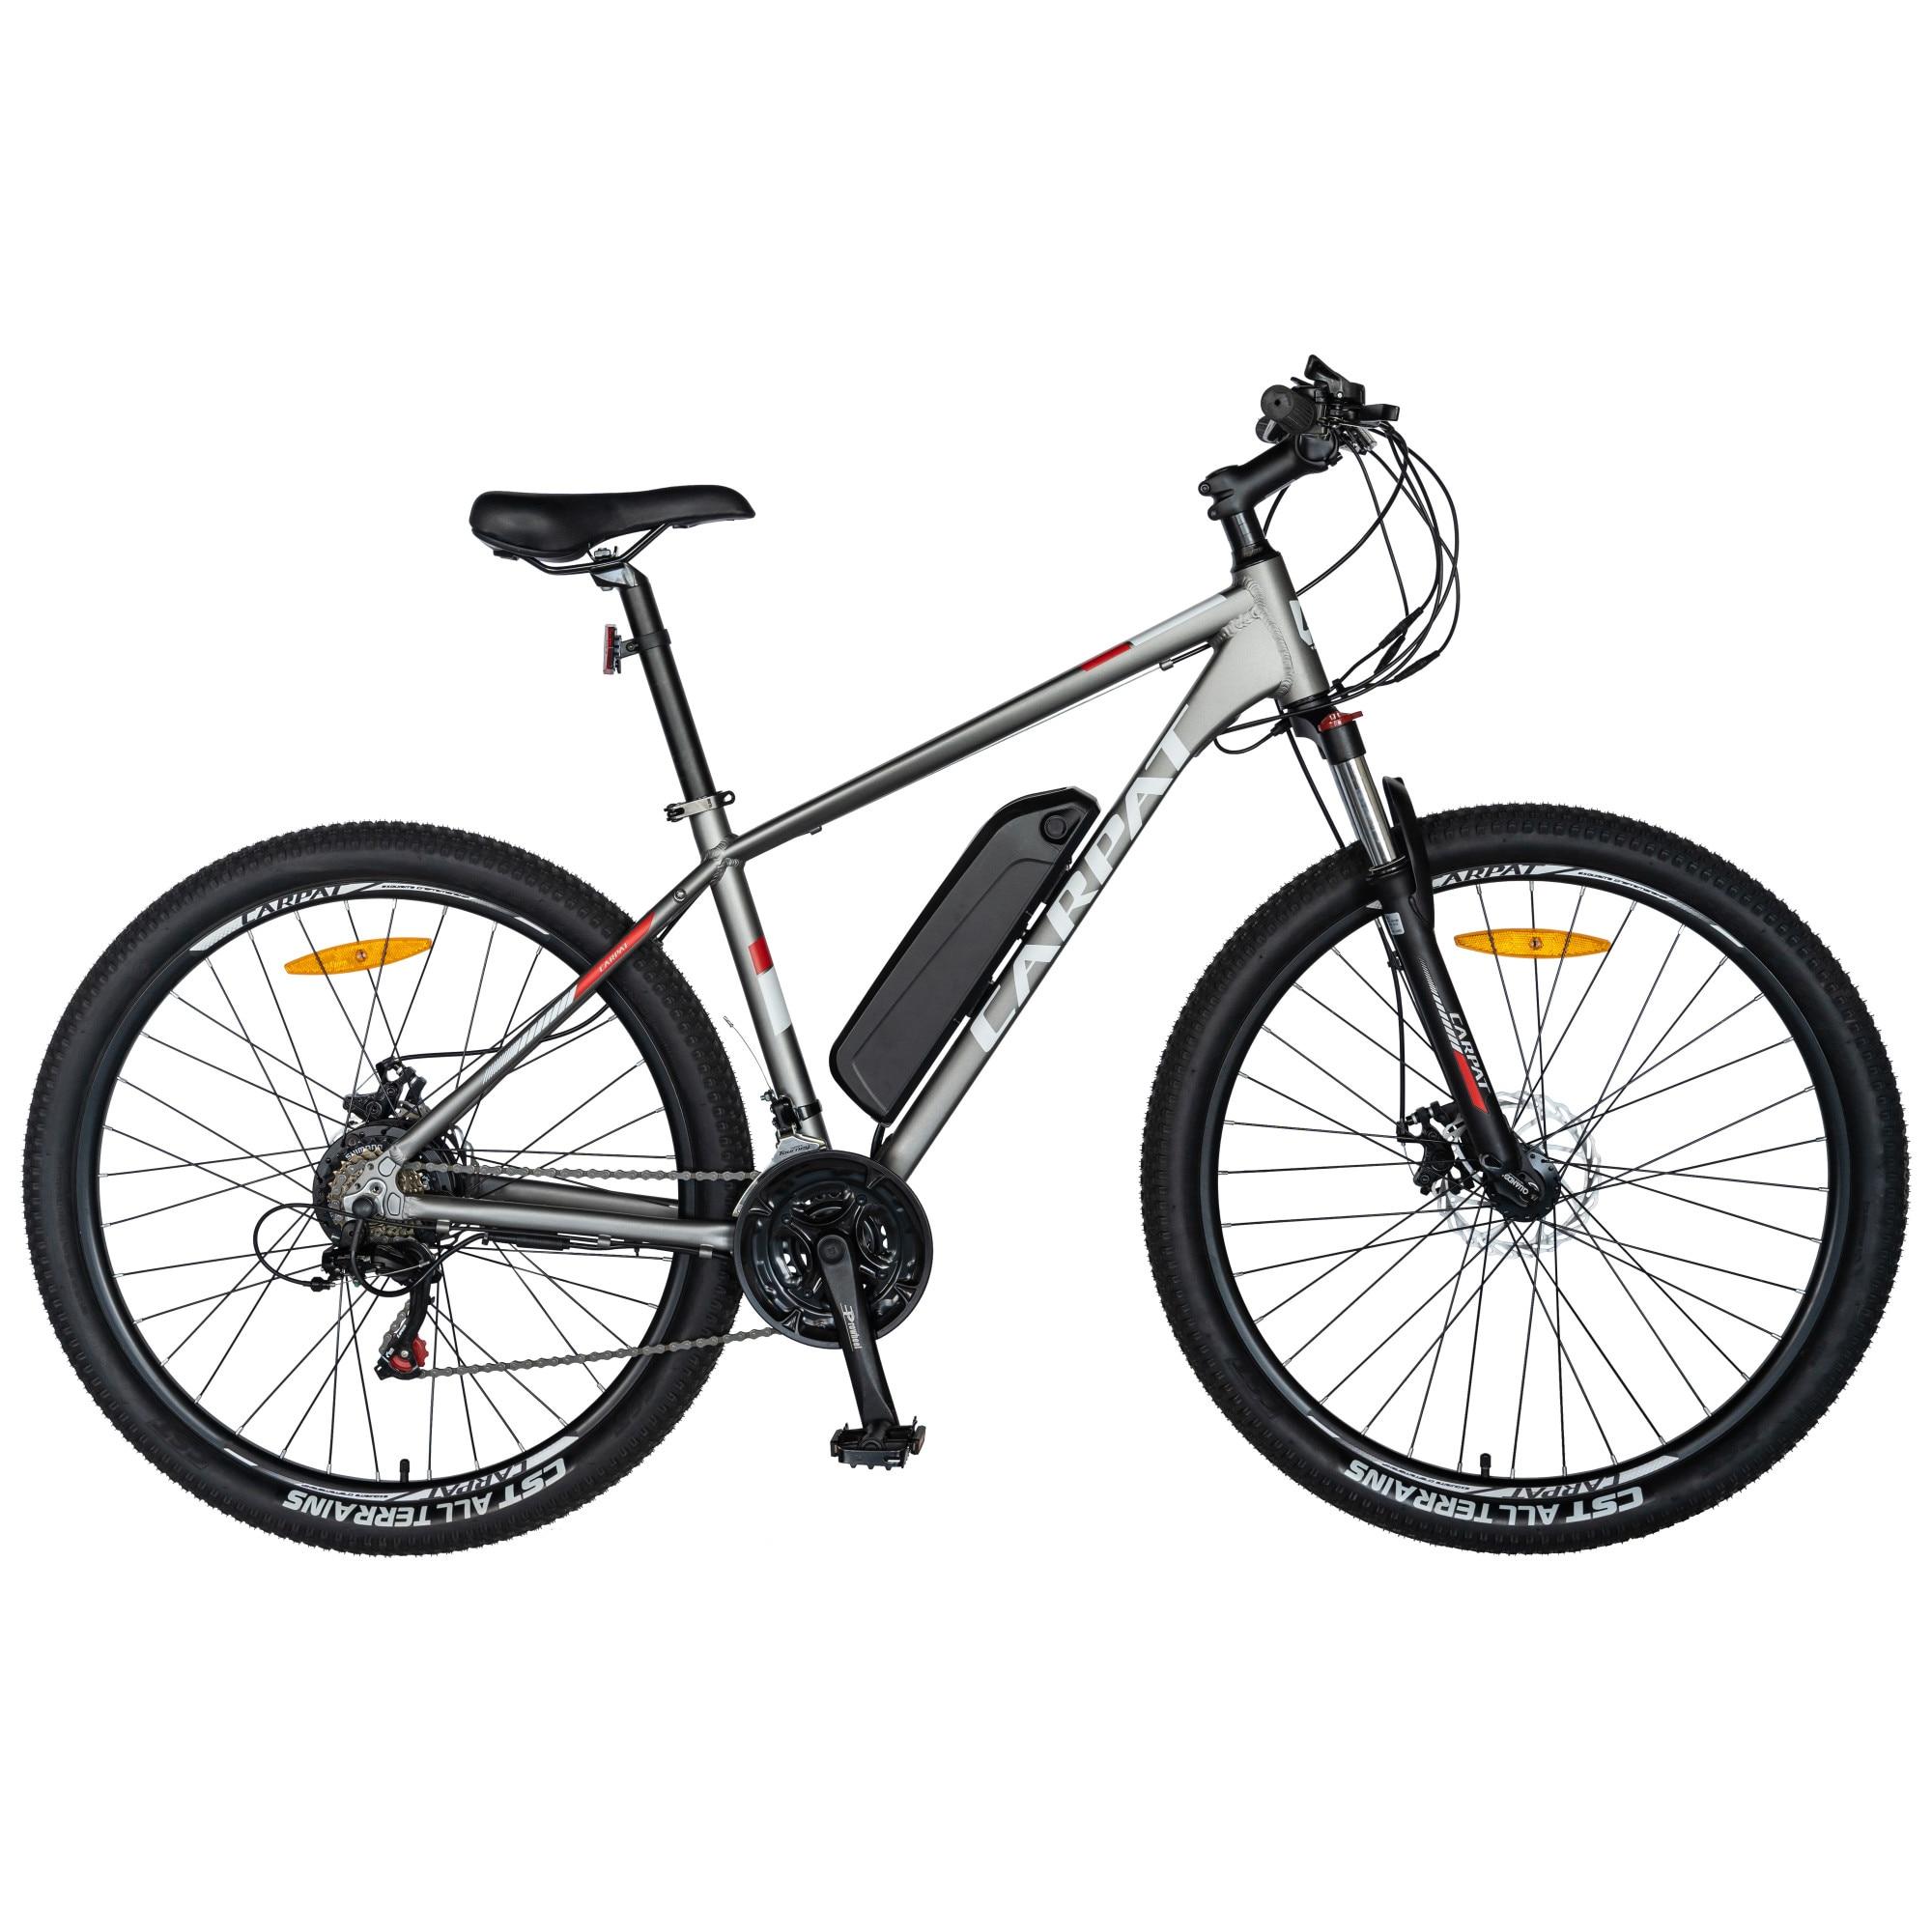 Fotografie Bicicleta Electrica MTB Carpat C1012E gri/alb, Roti 29 Inch , Motor 250W , Autonomie Max 60 Km